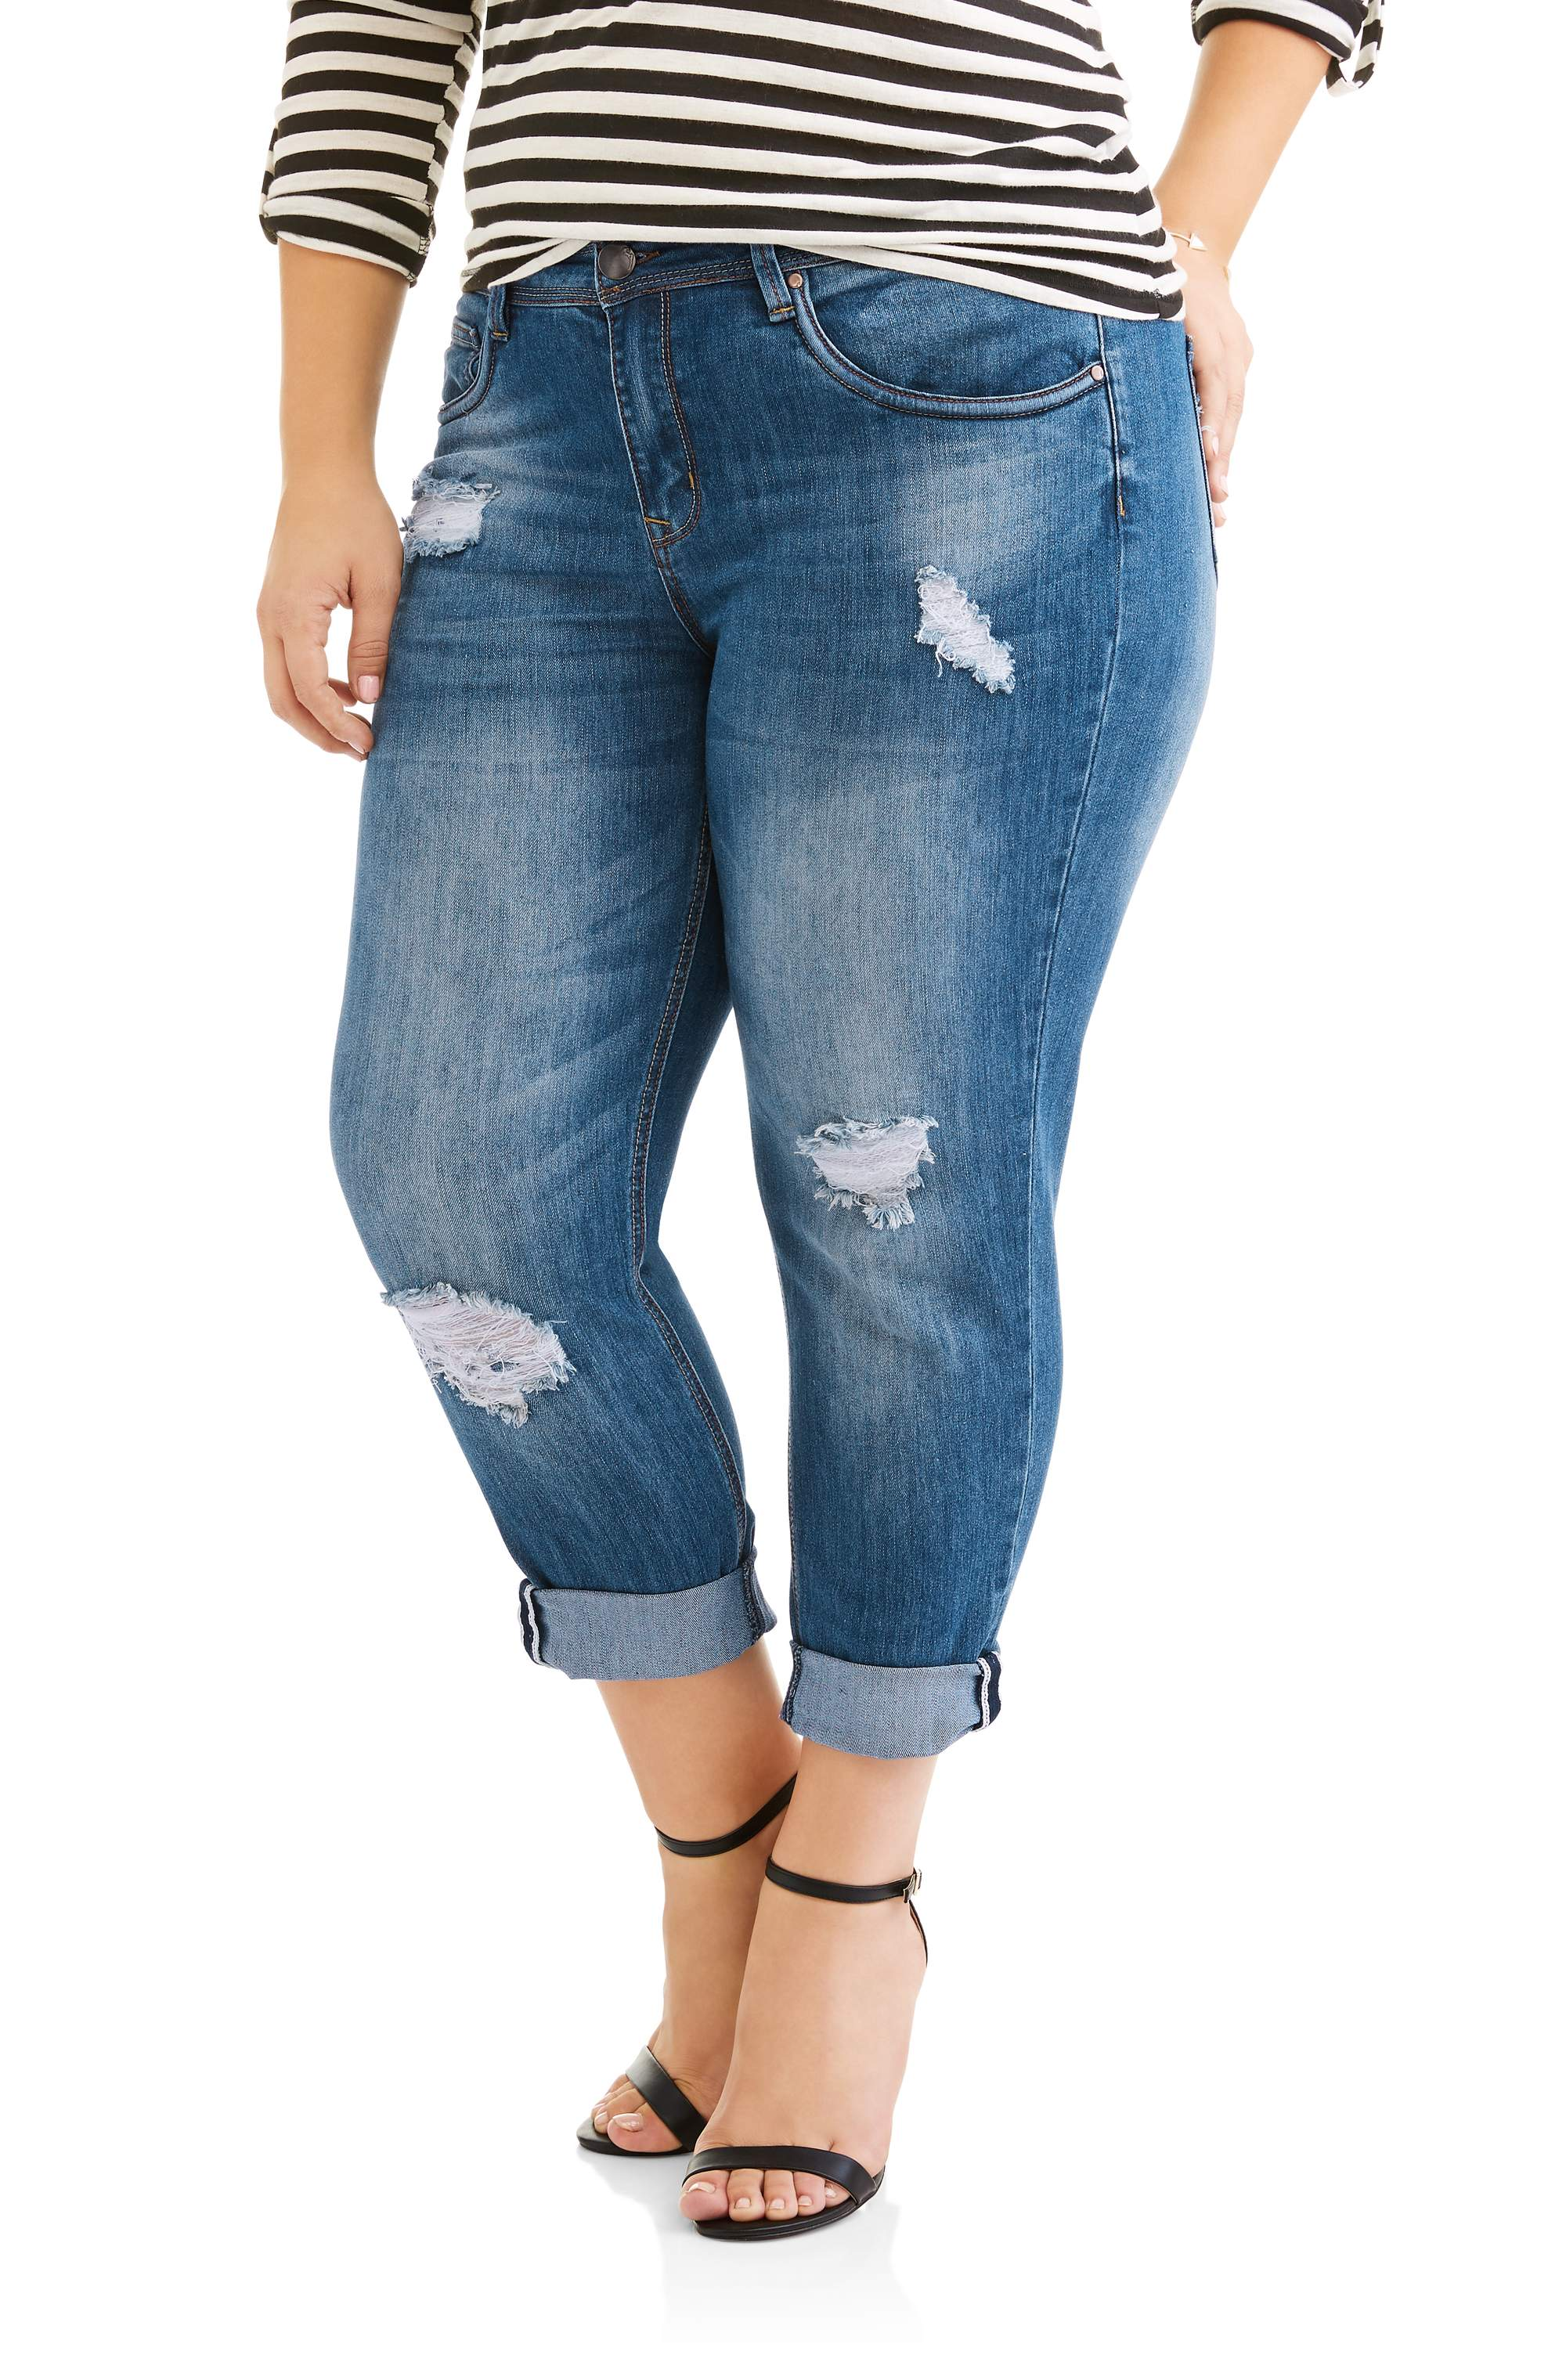 21e5b7a80 Juniors' Plus Size Cuffed Medium Wash Cropped Boyfriend Jeans With  Destruction